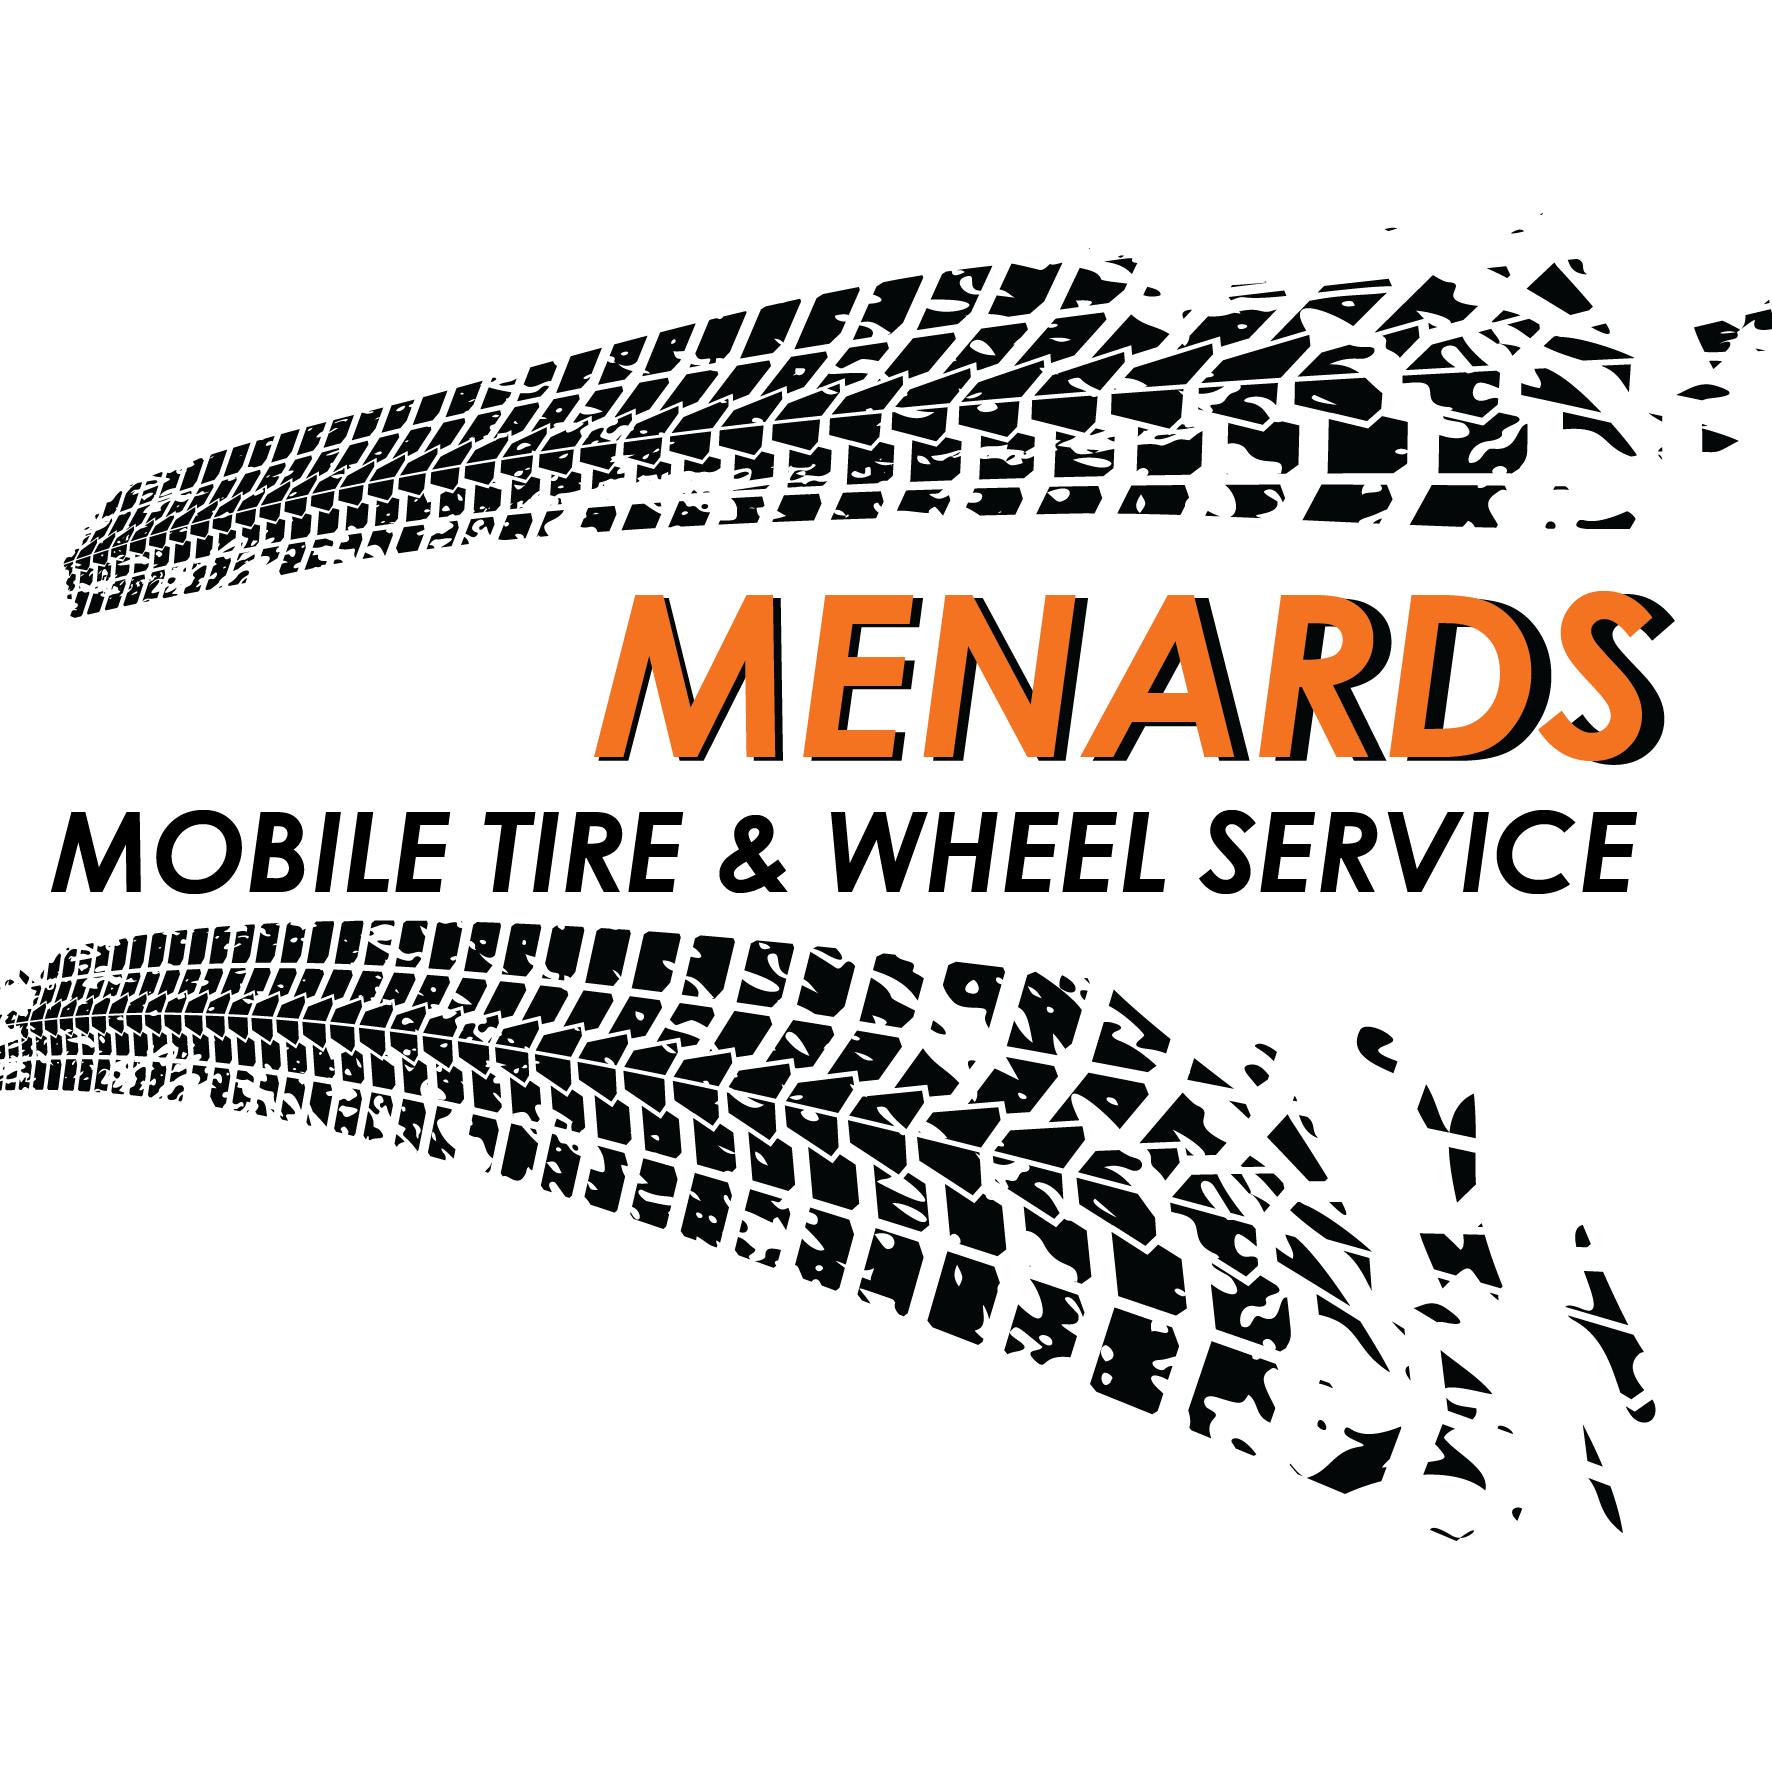 Menards Mobile Tire & Wheel, Inc